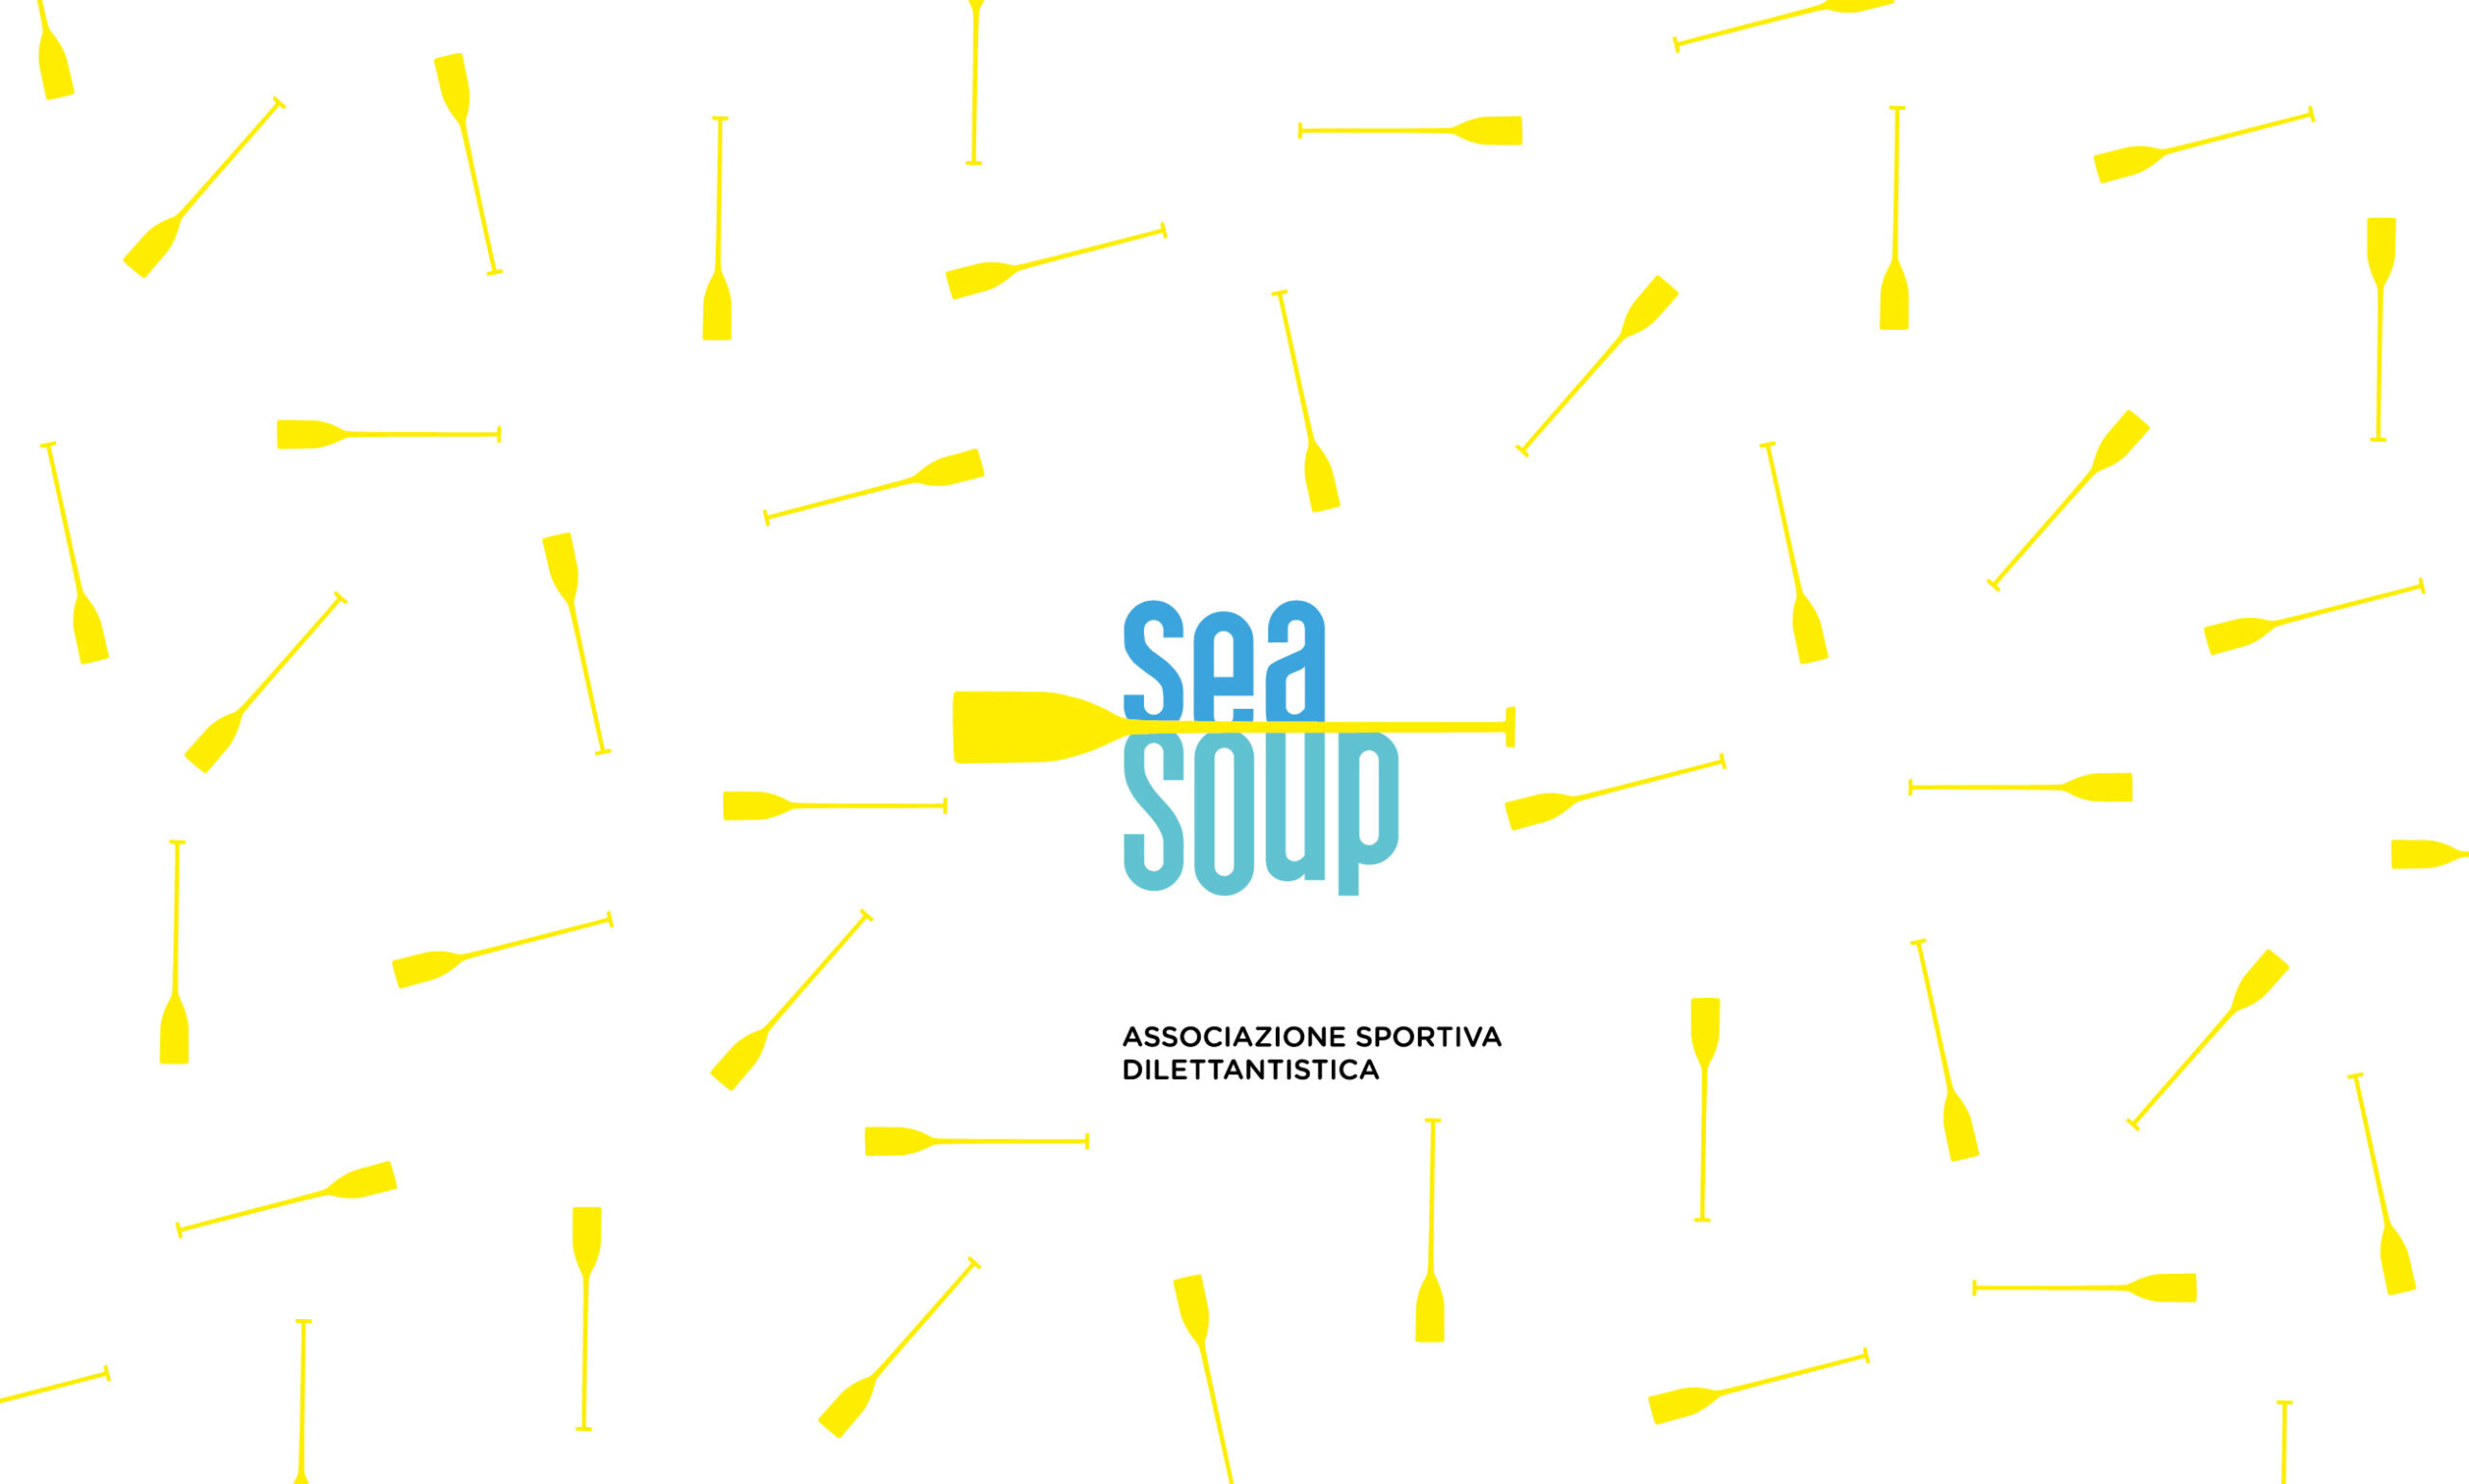 Sea Soup Associazione Sportiva Dilettantistica